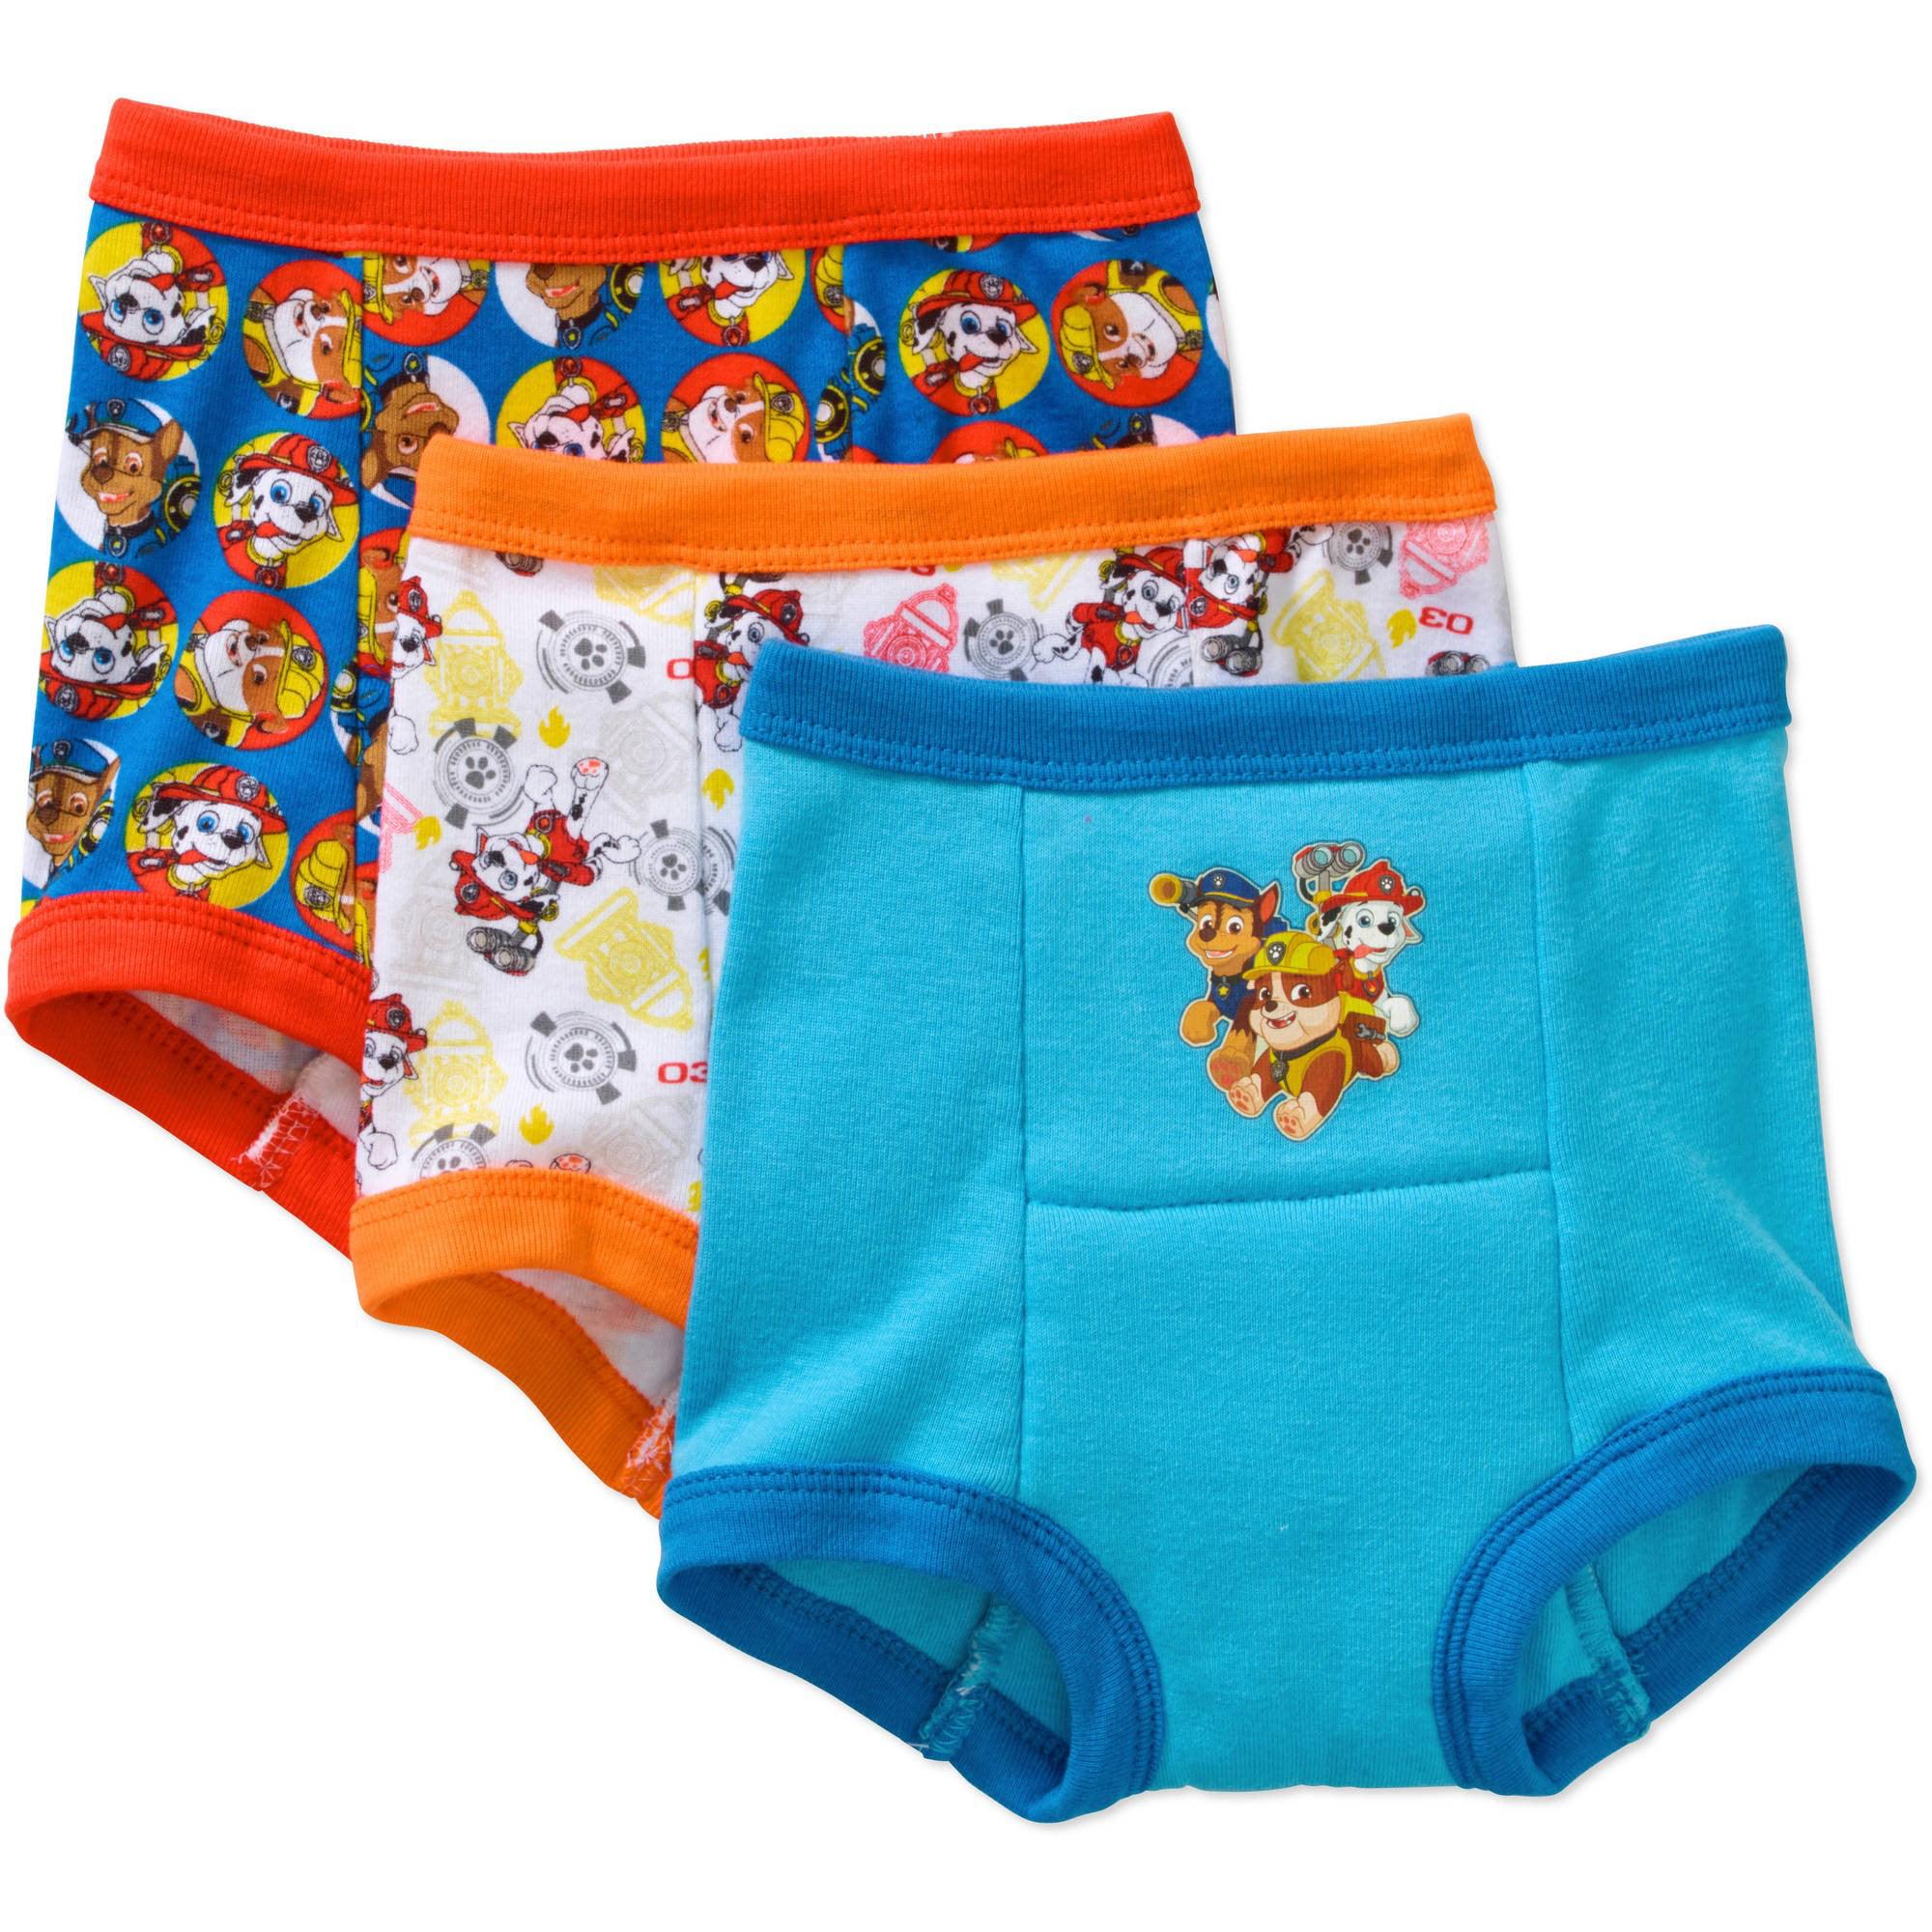 Baby Shark Boys Baby and Toddler Potty Training Underwear